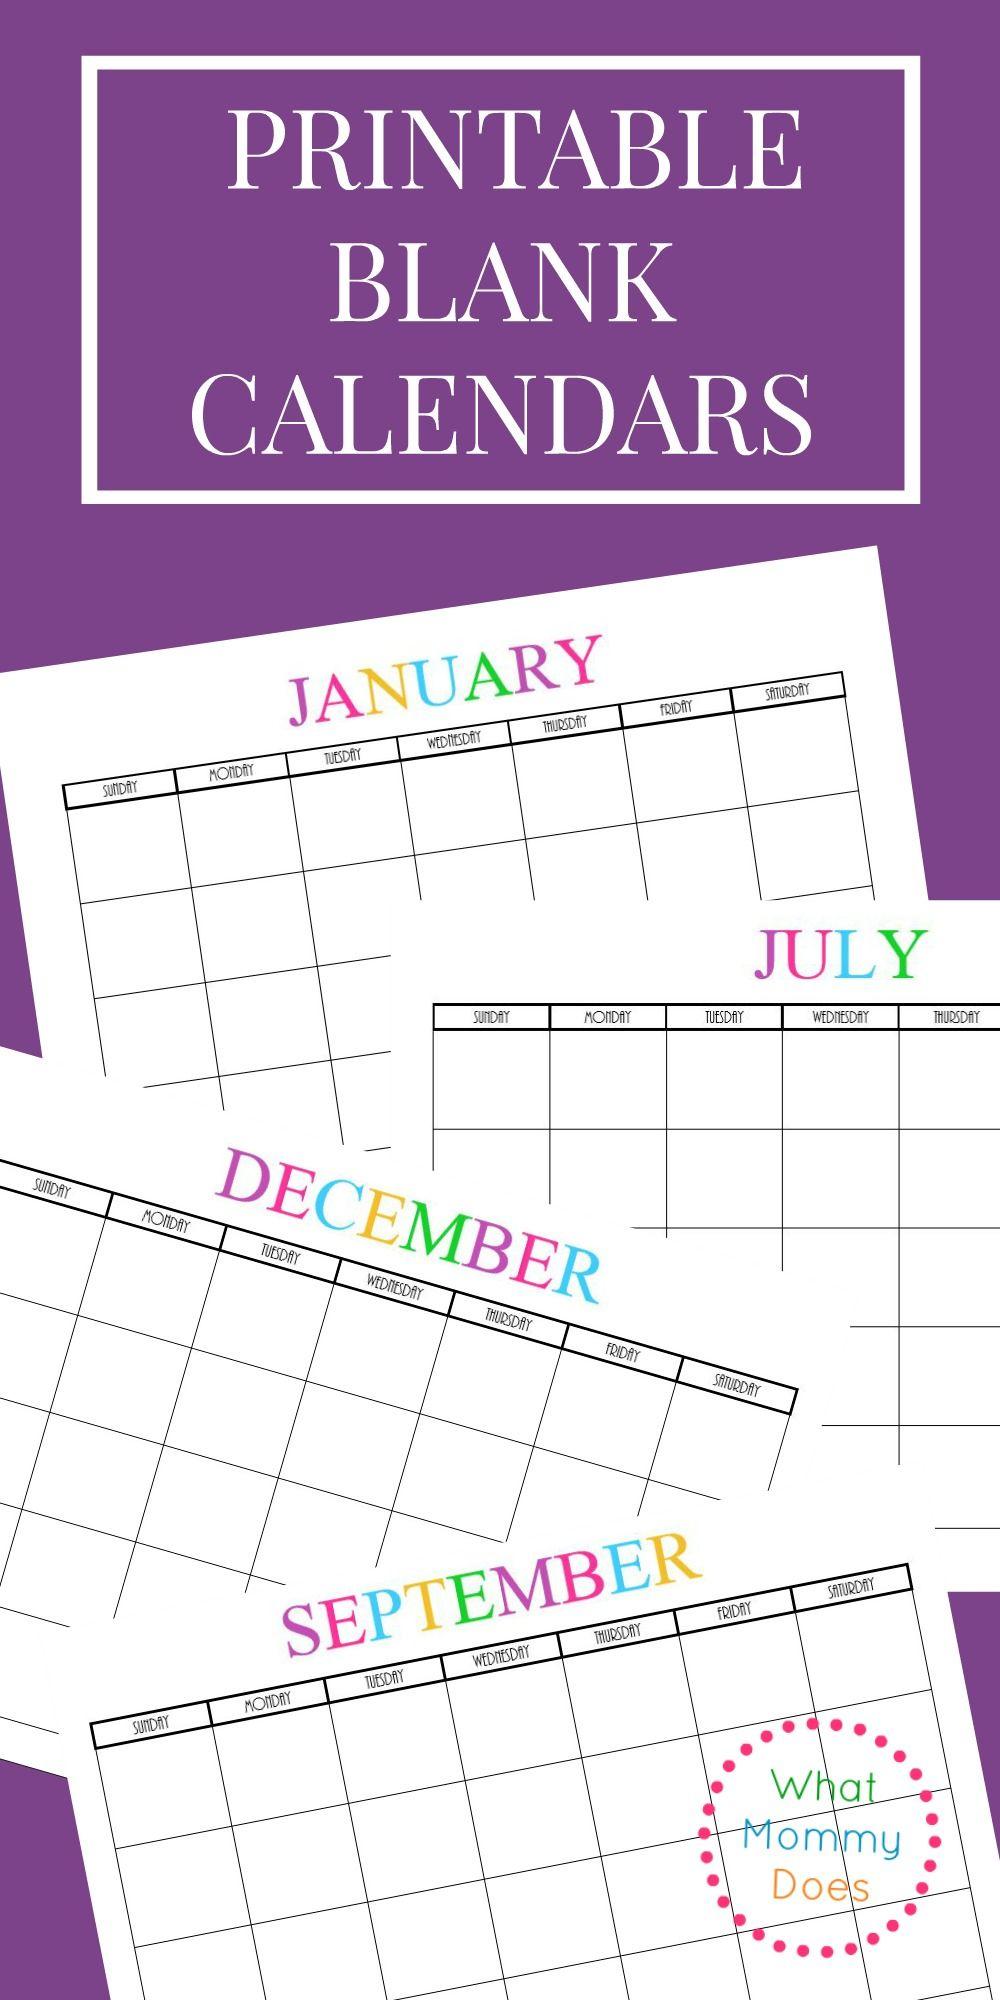 Free Printable Blank Monthly Calendars – 2018, 2019, 2020